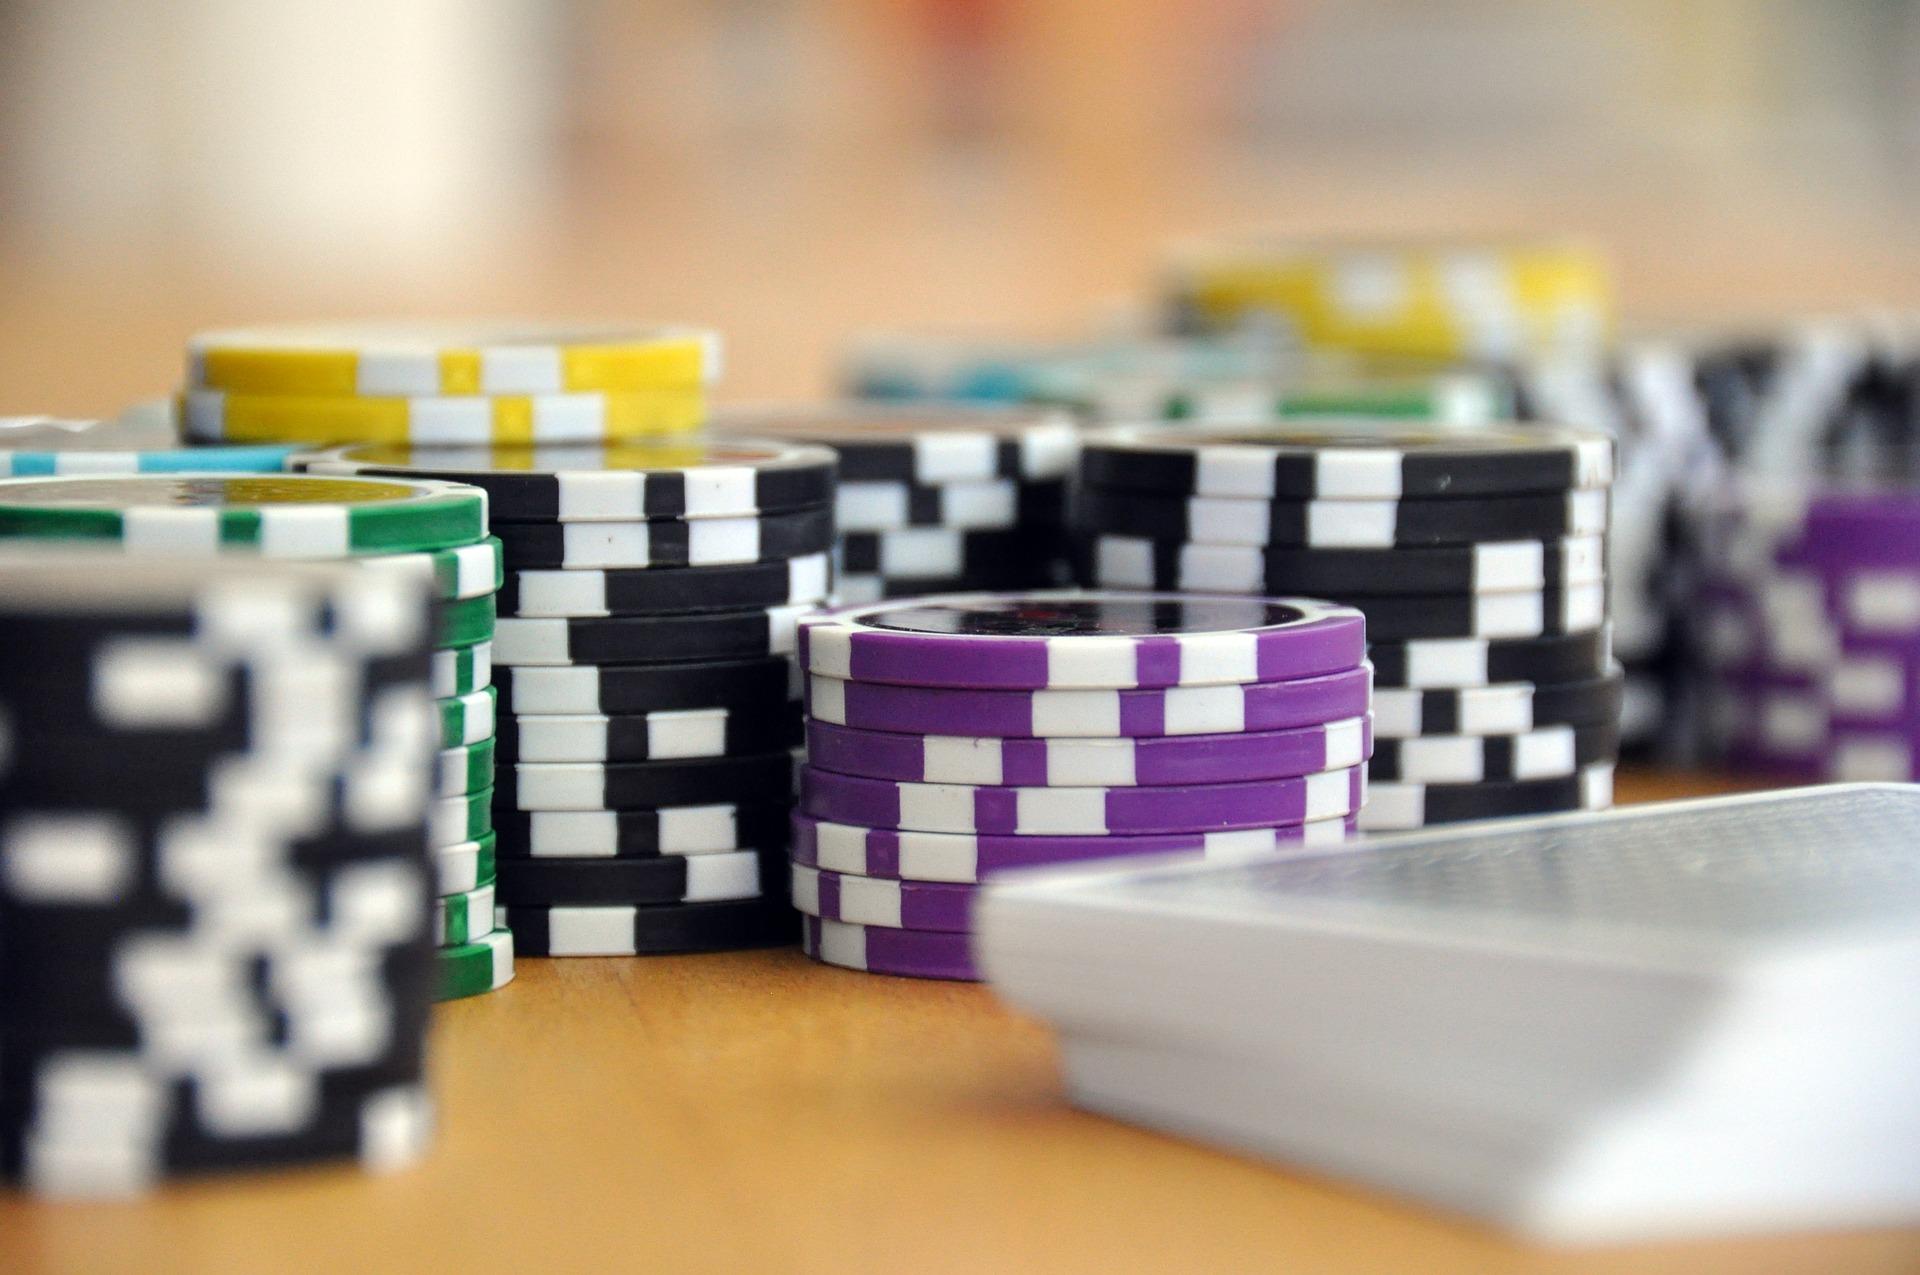 Distress tolerance gambling rules